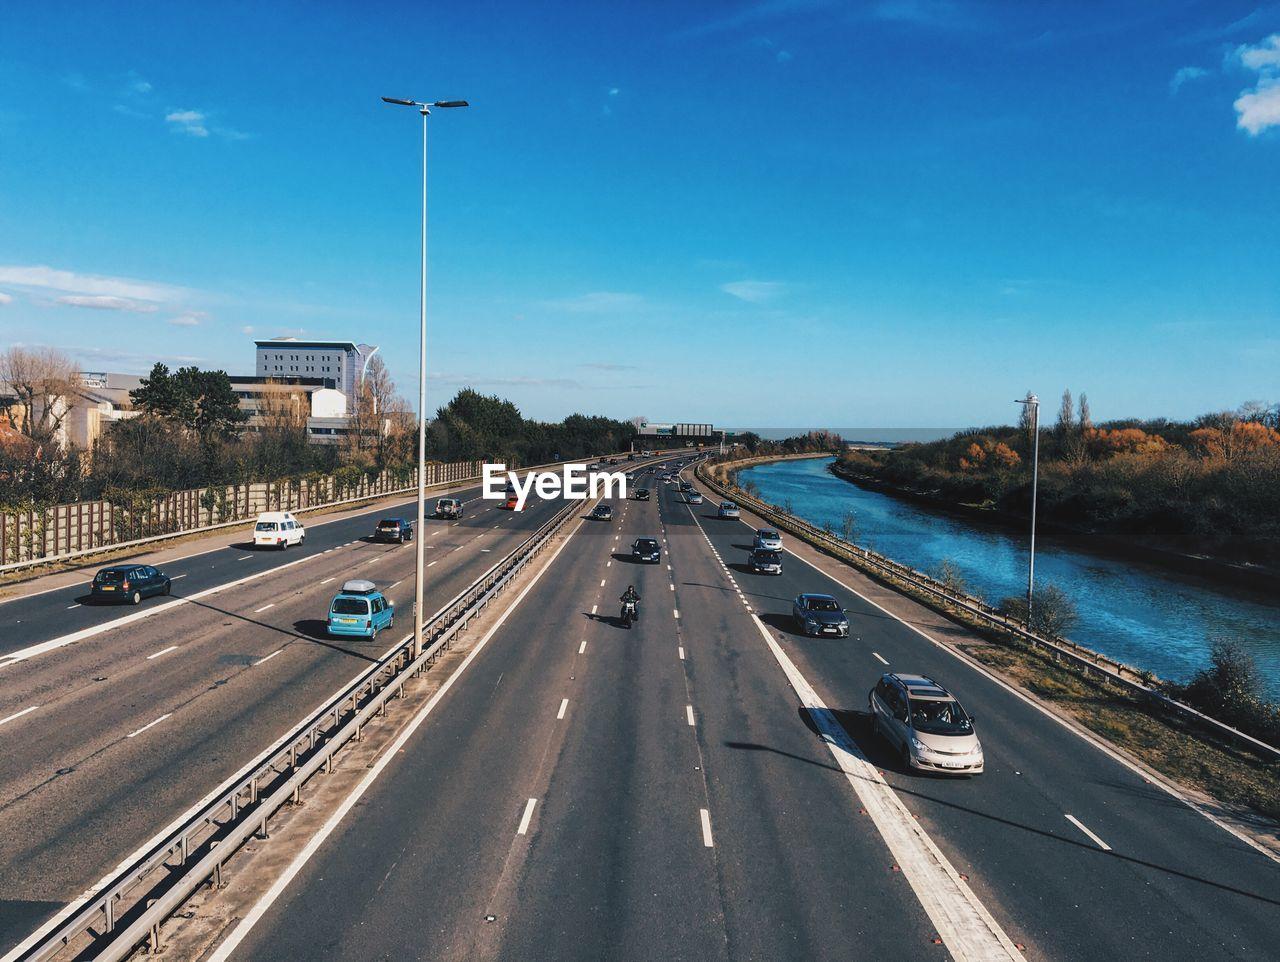 Road Passing Through City Against Sky